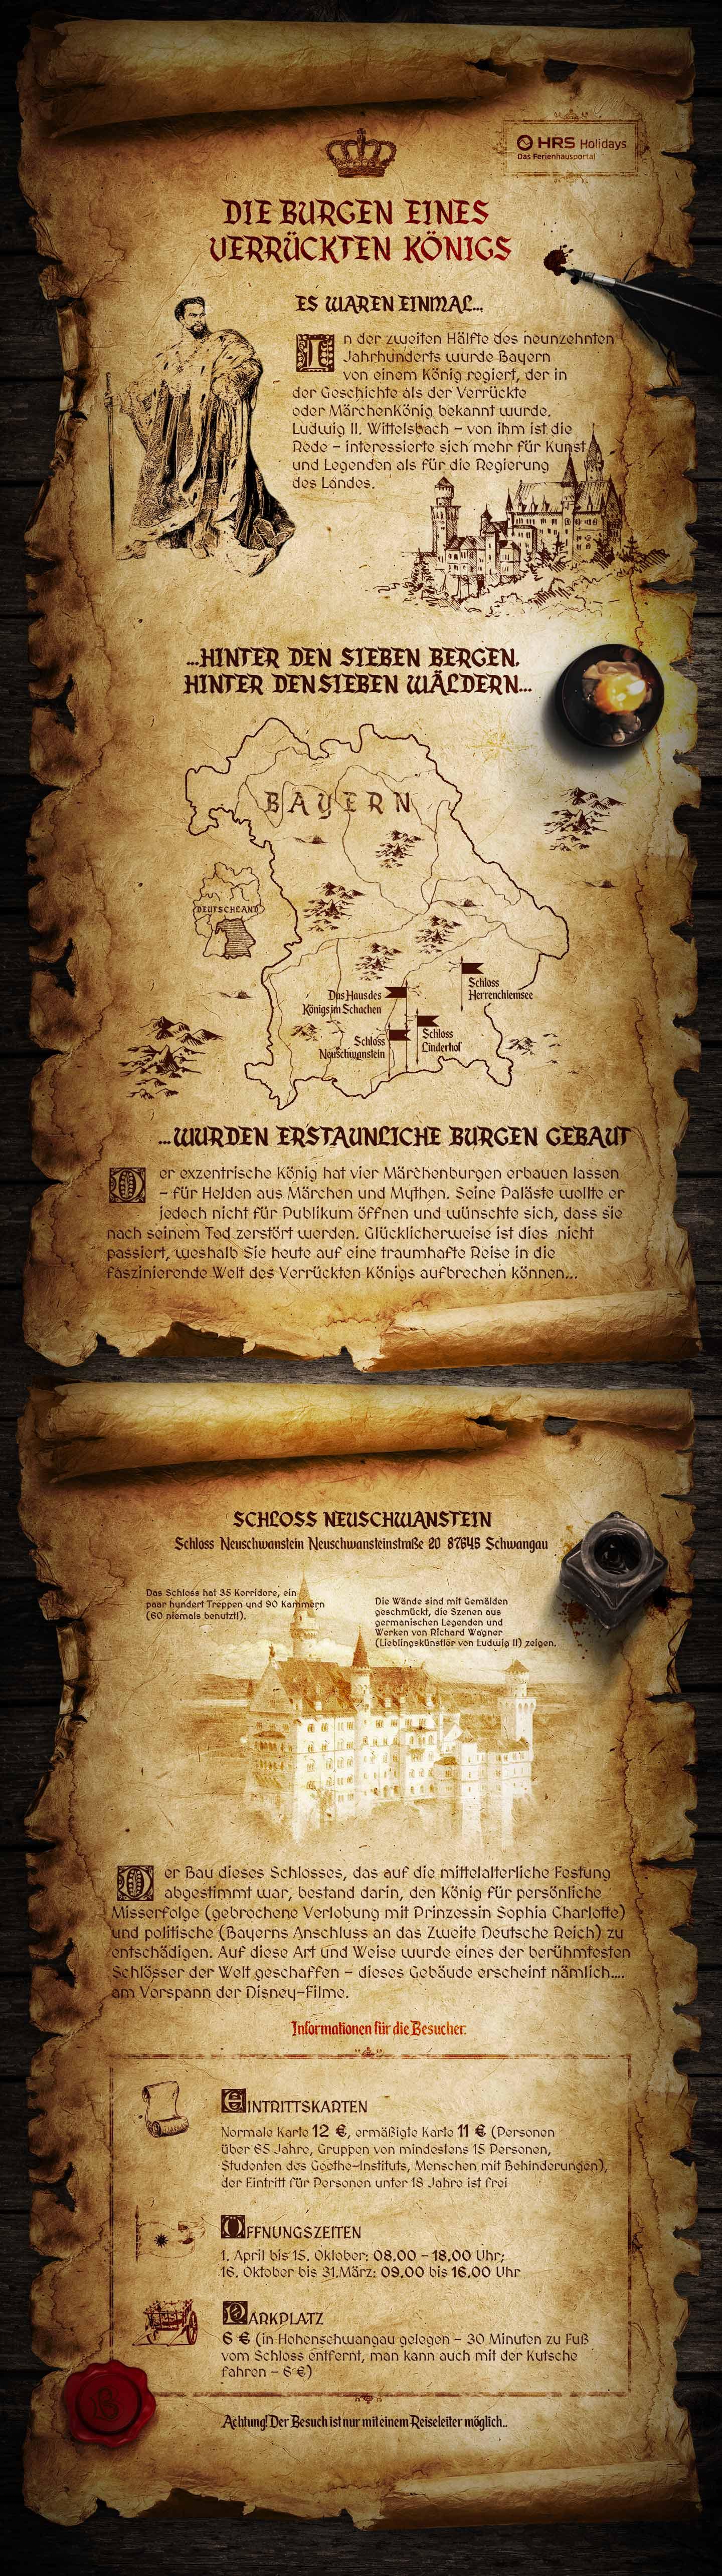 Bauwerke von König Ludwig II